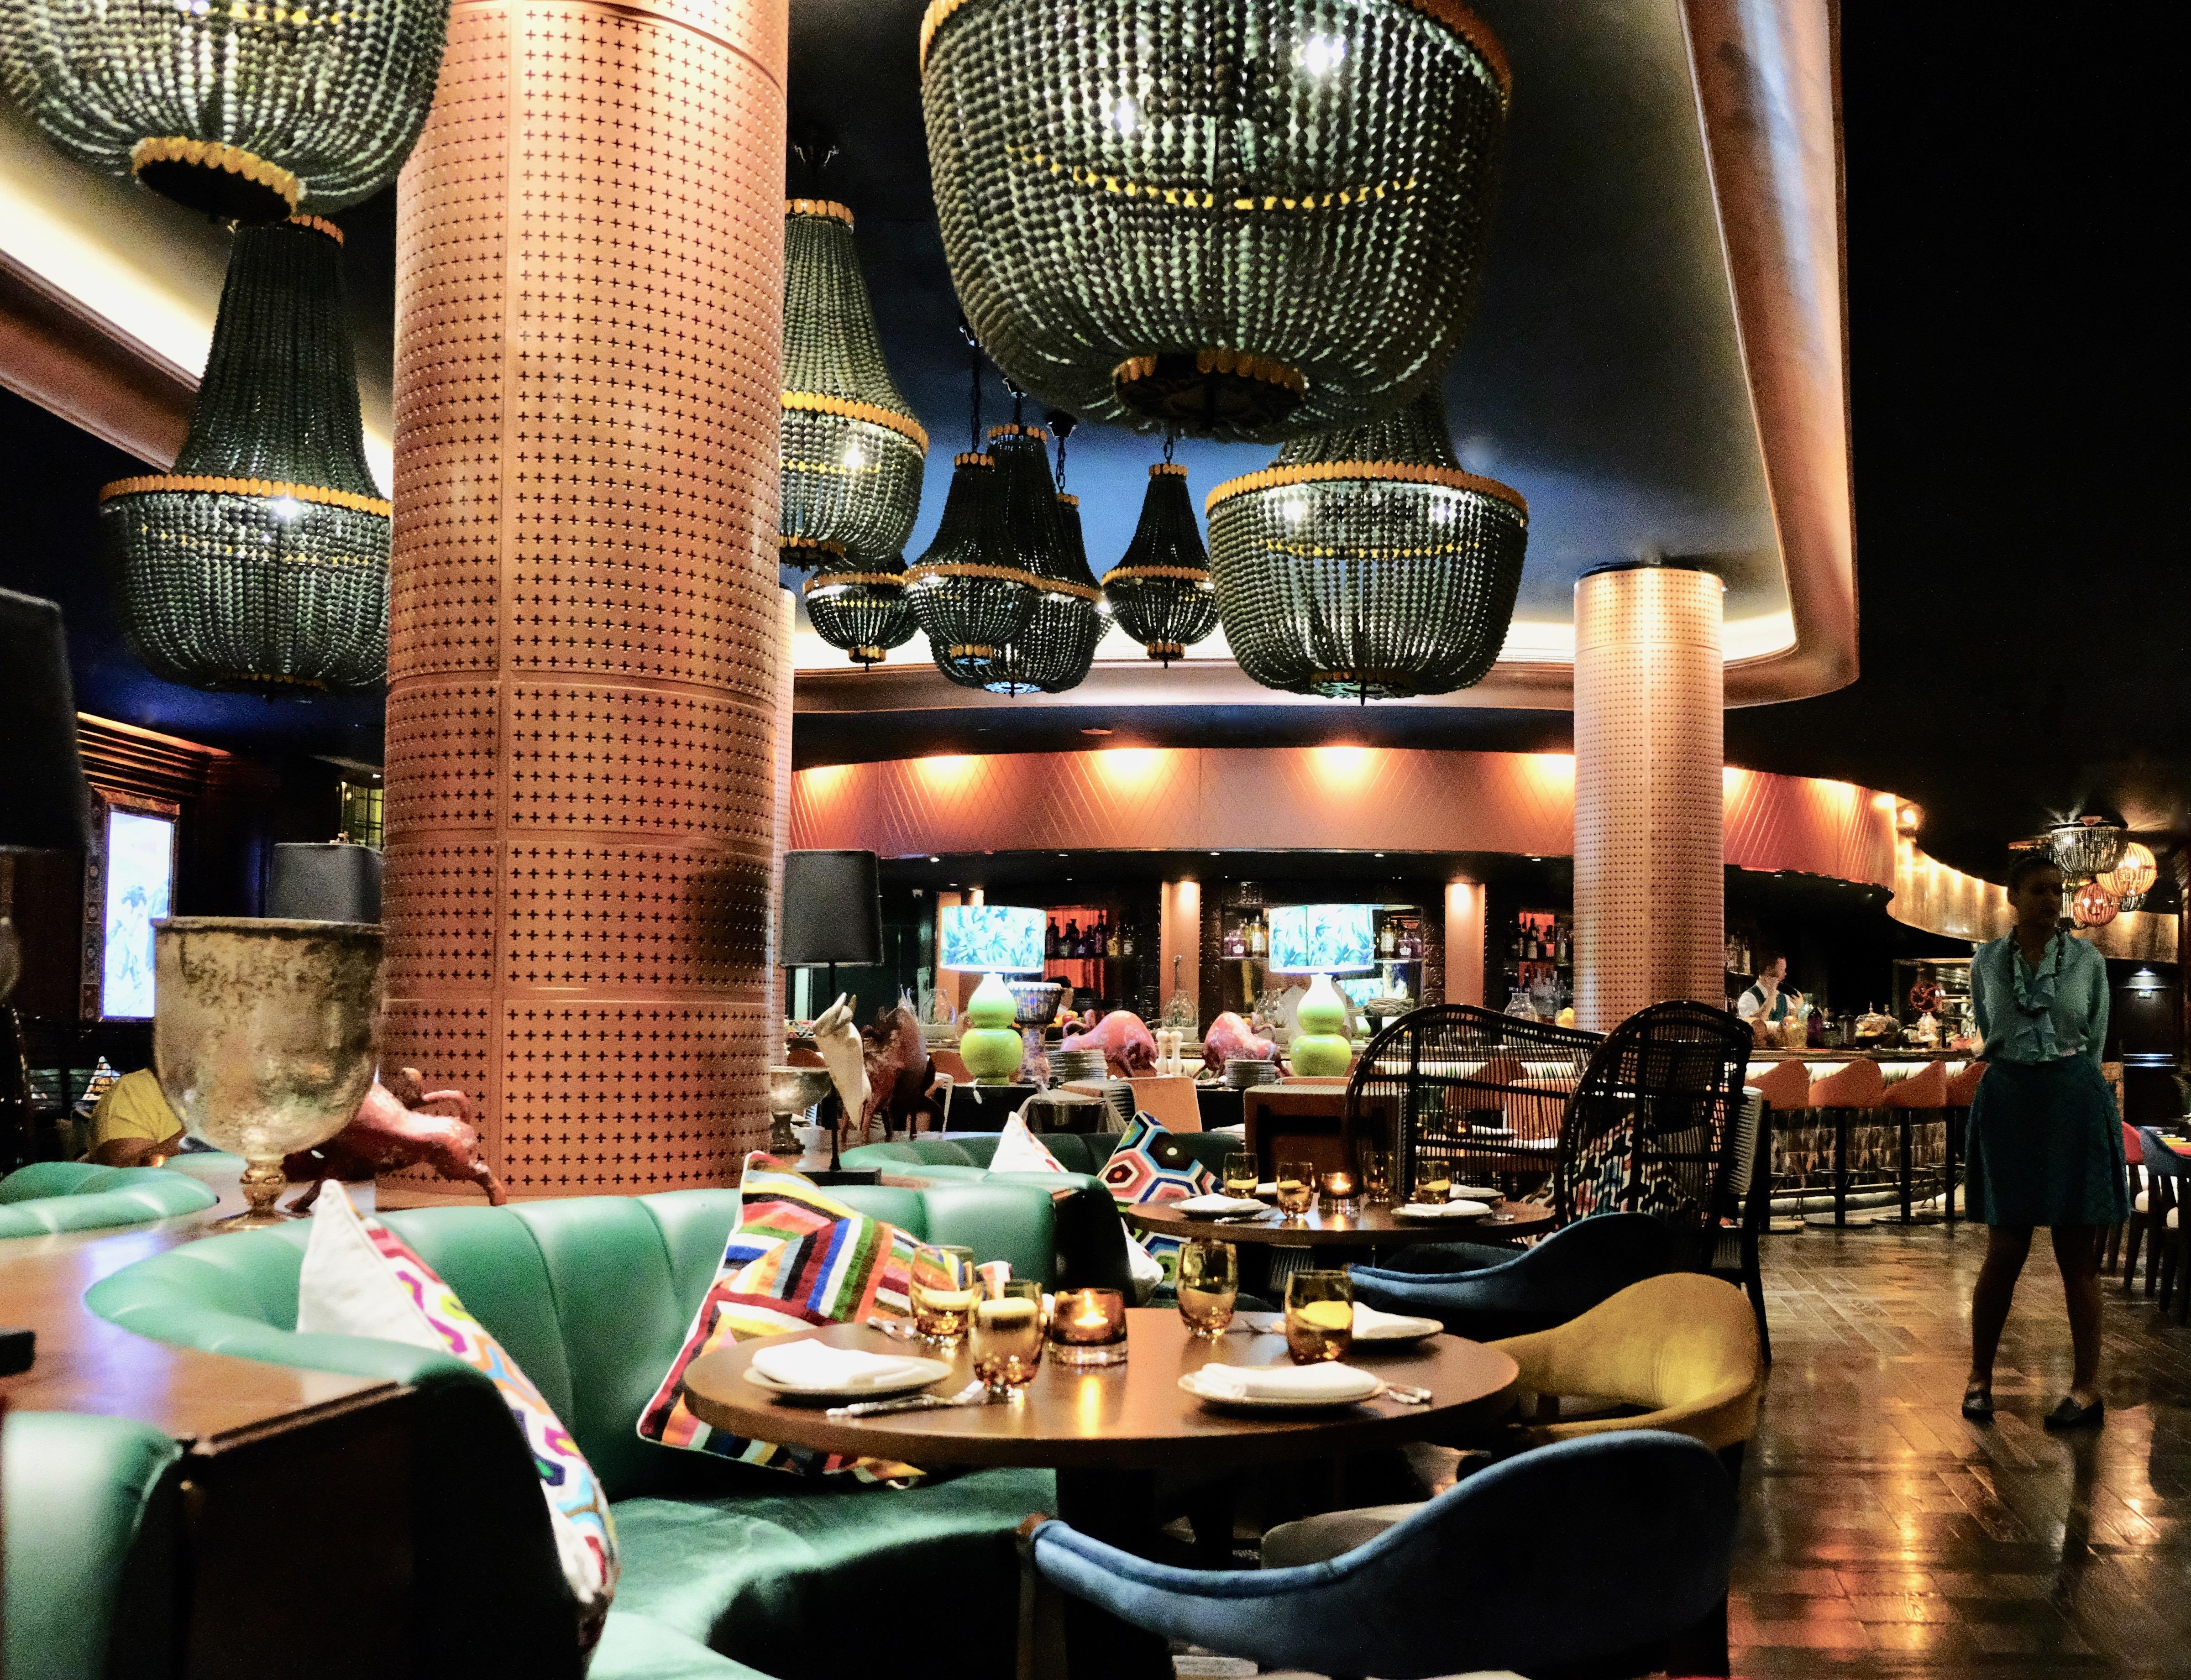 Toro Toro | Abu Dhabi. u201c & Toro Toro | Abu Dhabi u2013 anexpatabroad